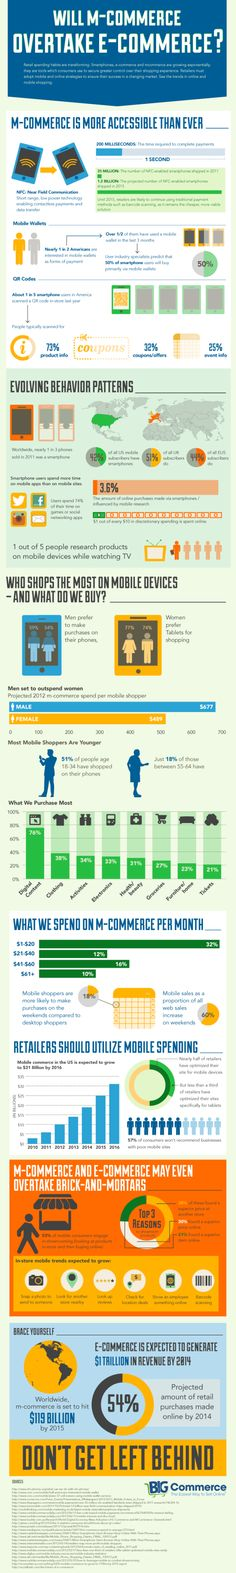 M-commerce vs. E-commerce